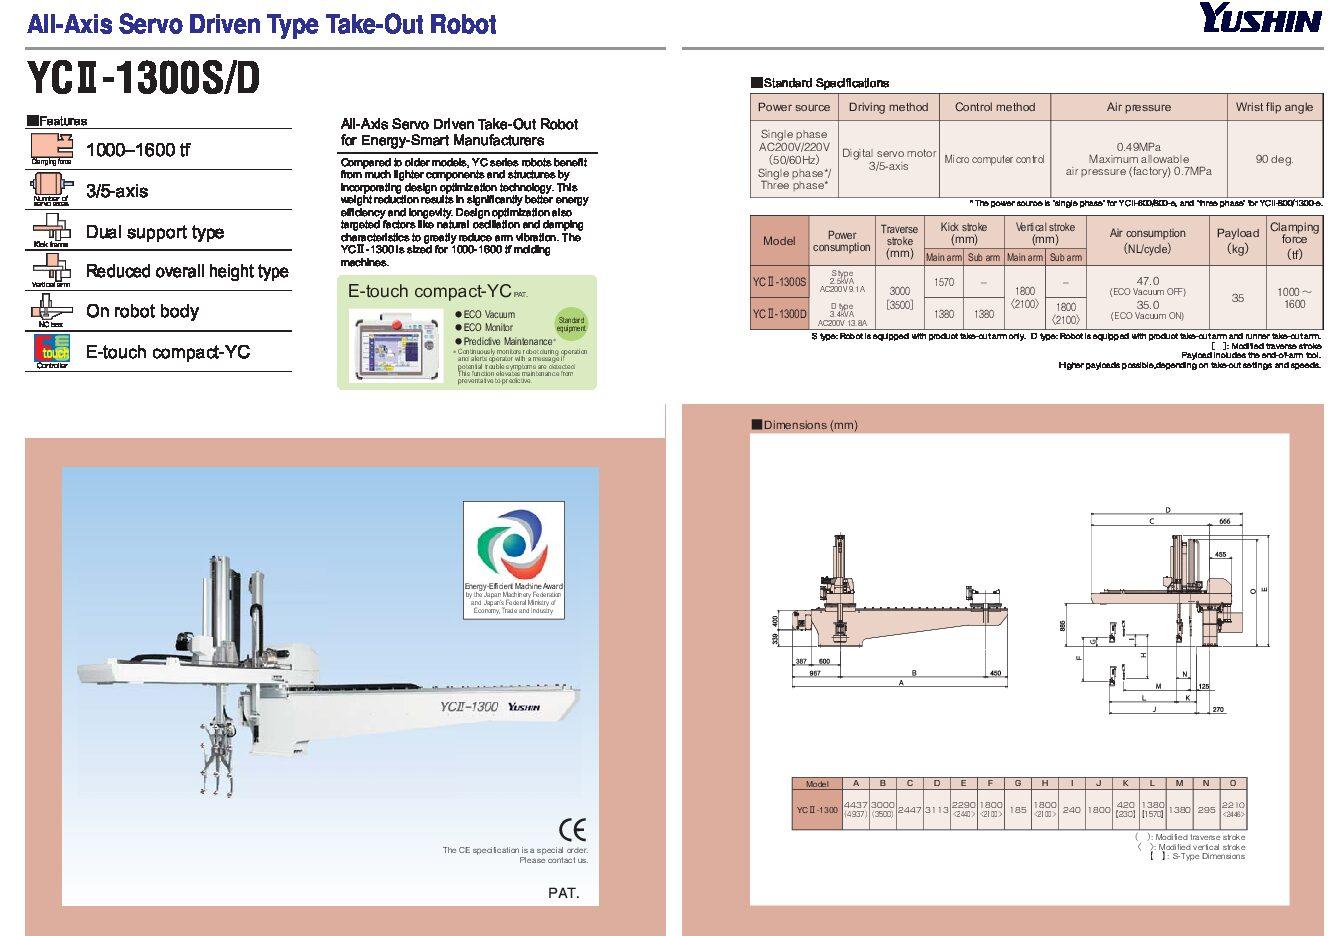 yc2 1300sd en pdf